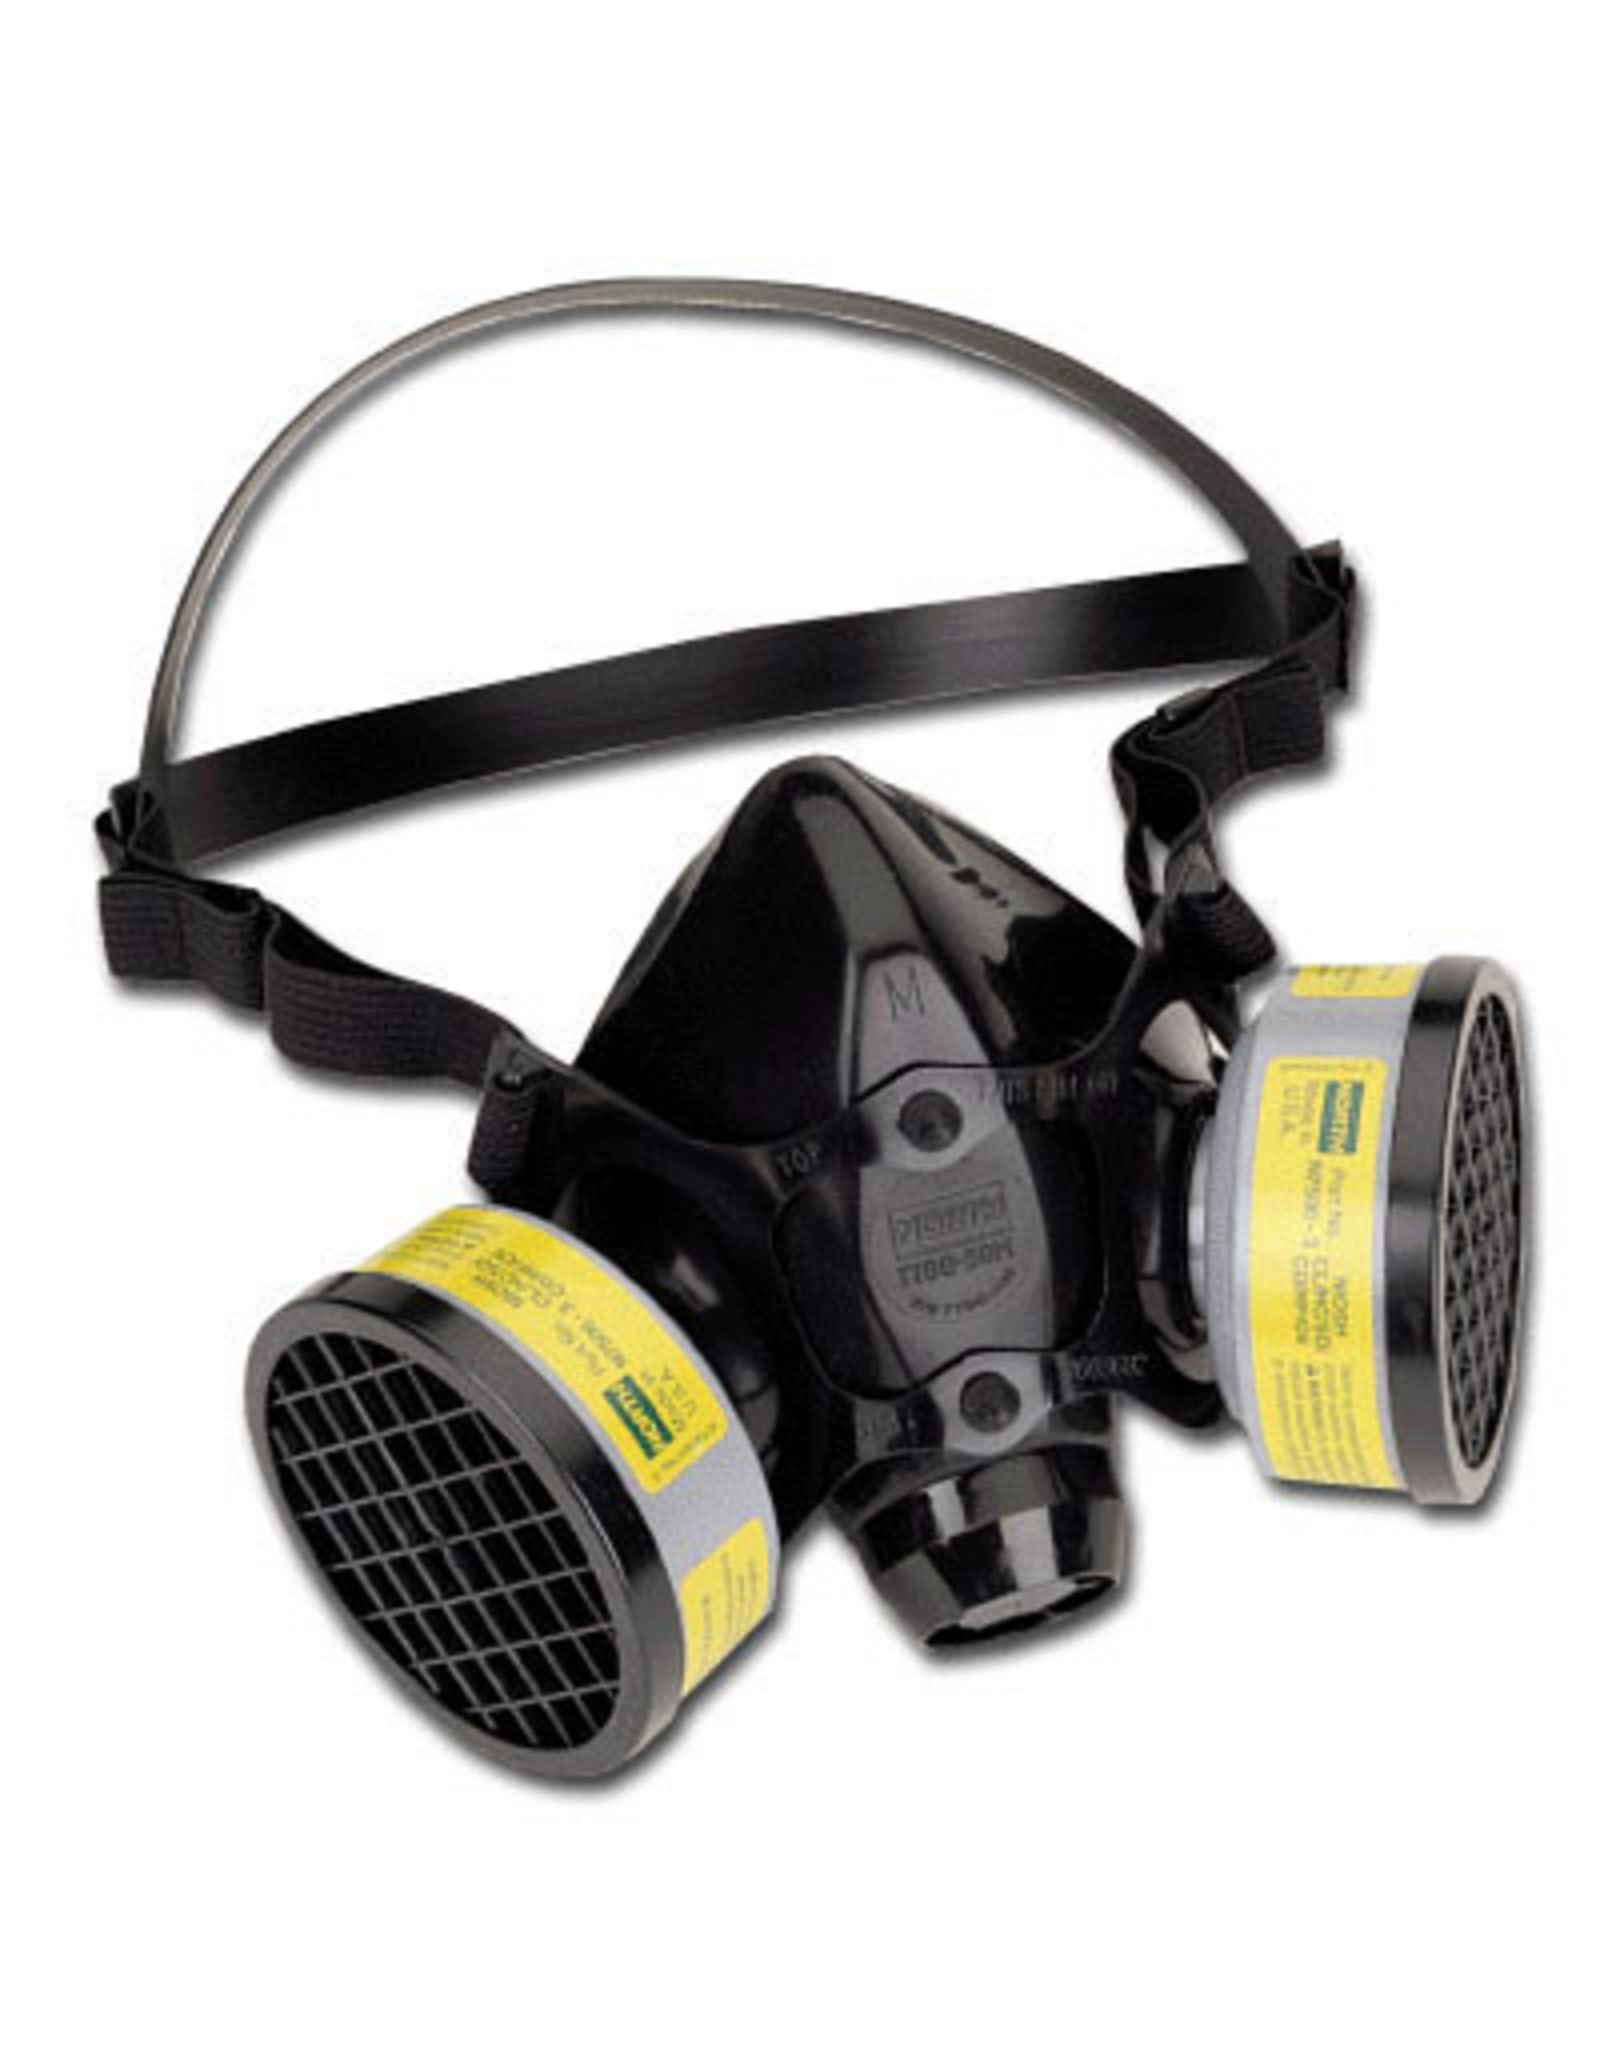 North 7700 Respirator Half Mask Respirator